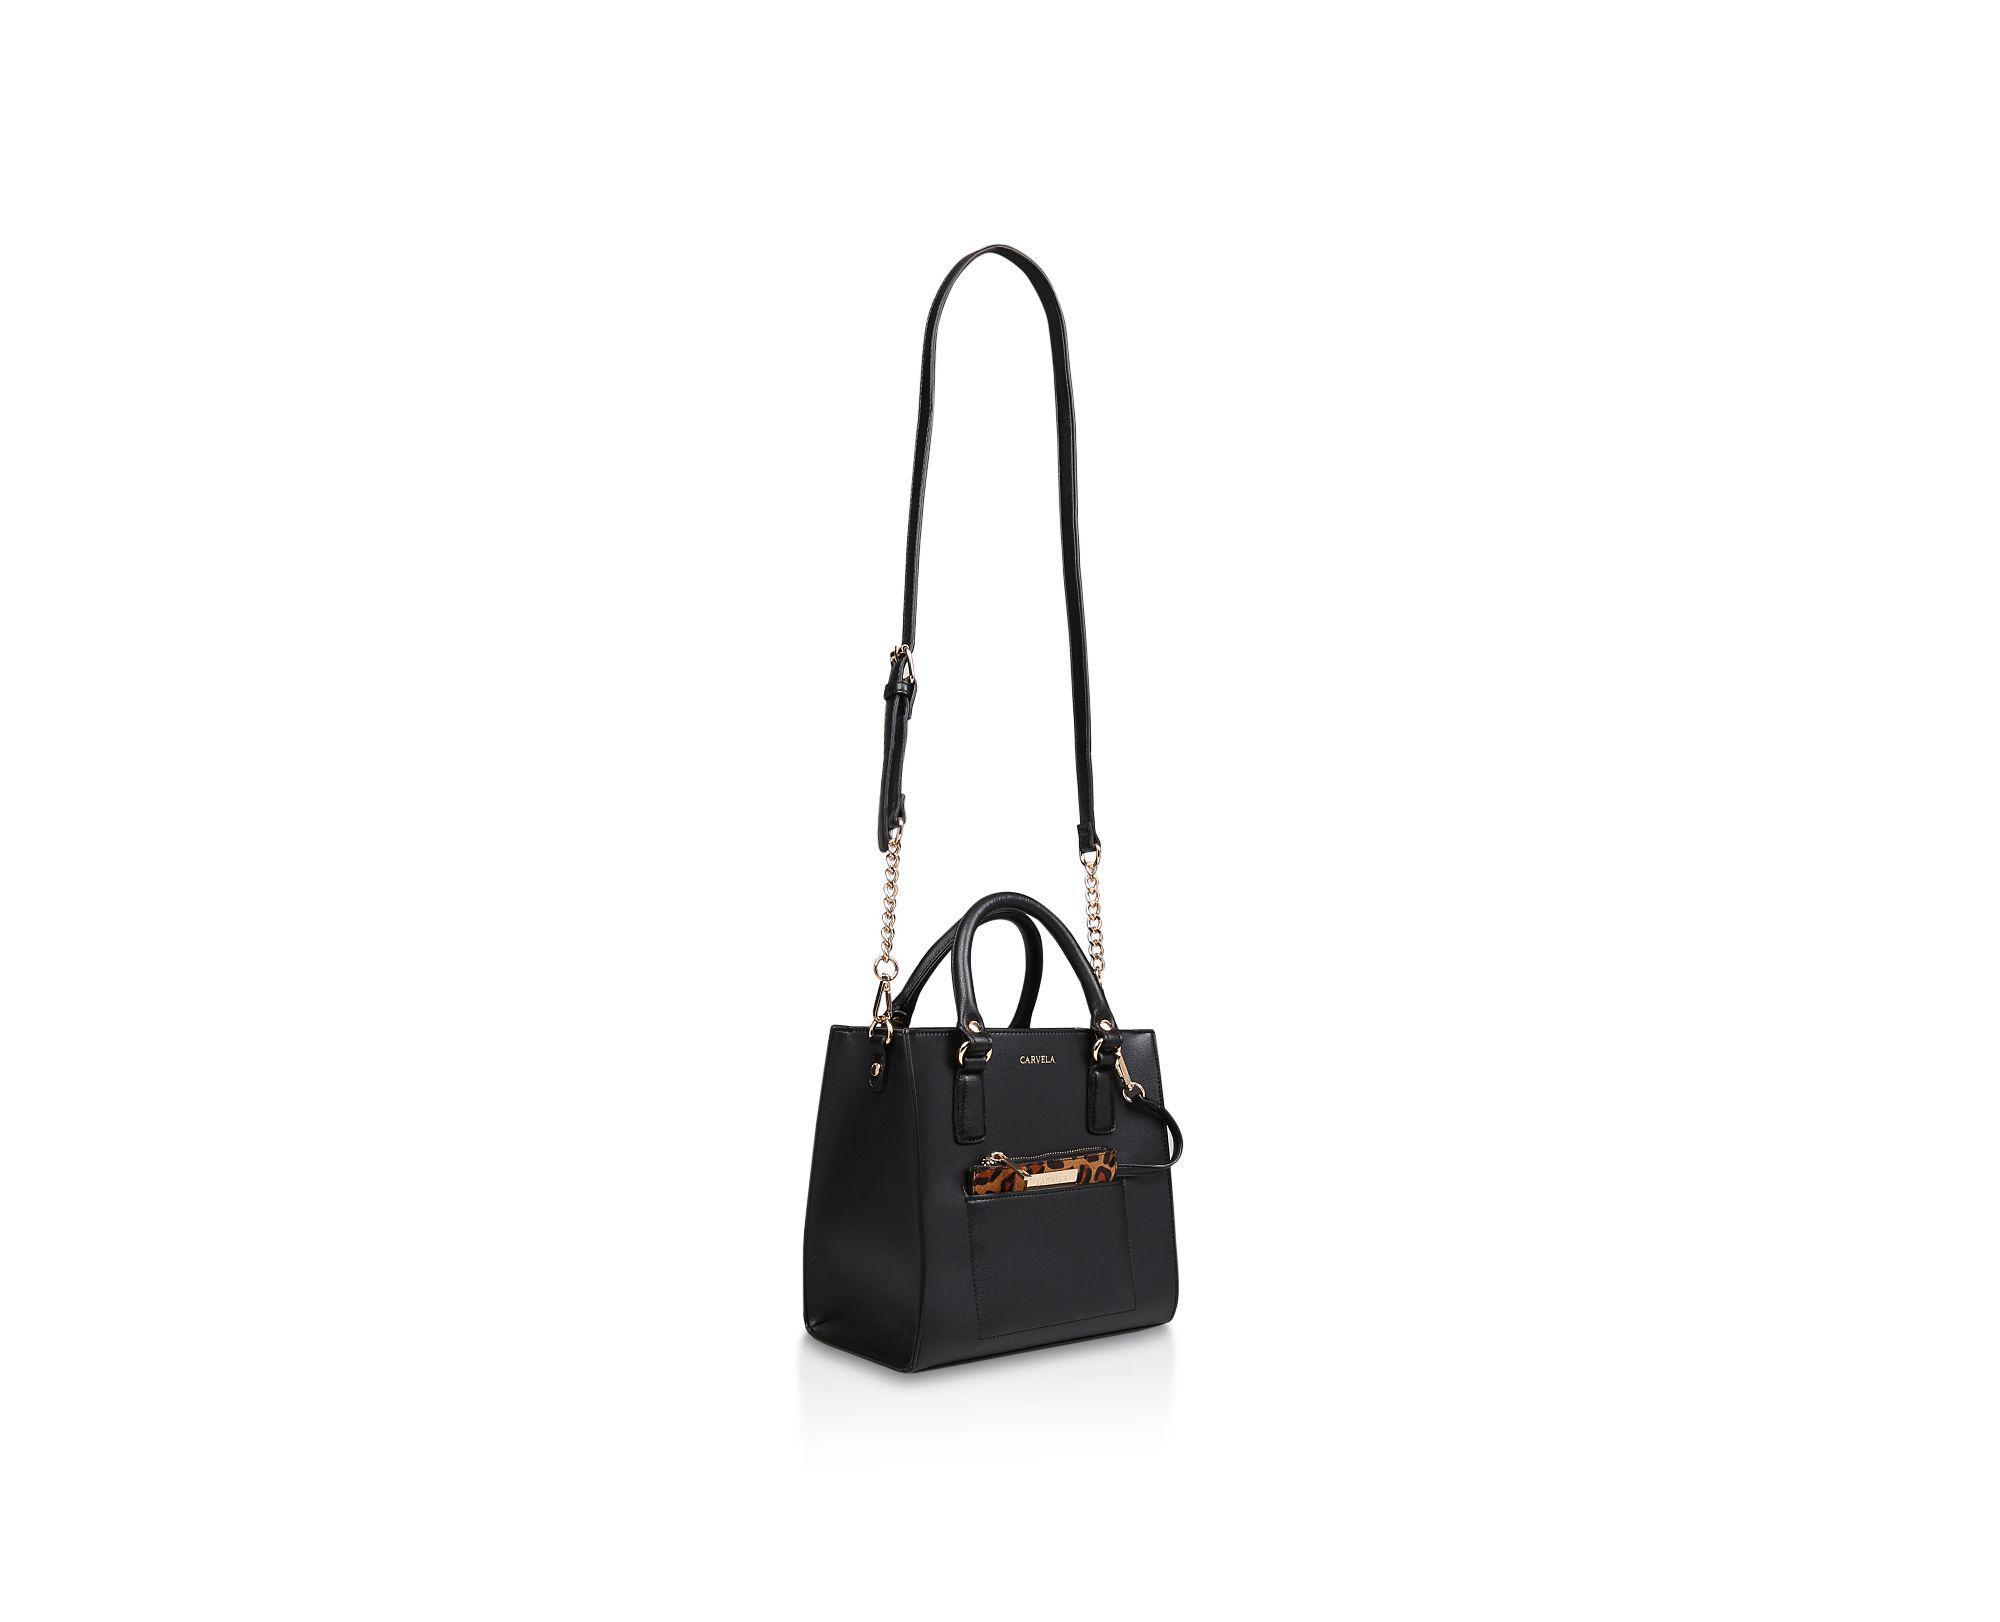 Carvela Kurt Geiger Black  simba Pocket Purse Tote  Tote Bag With ... 05077f7073